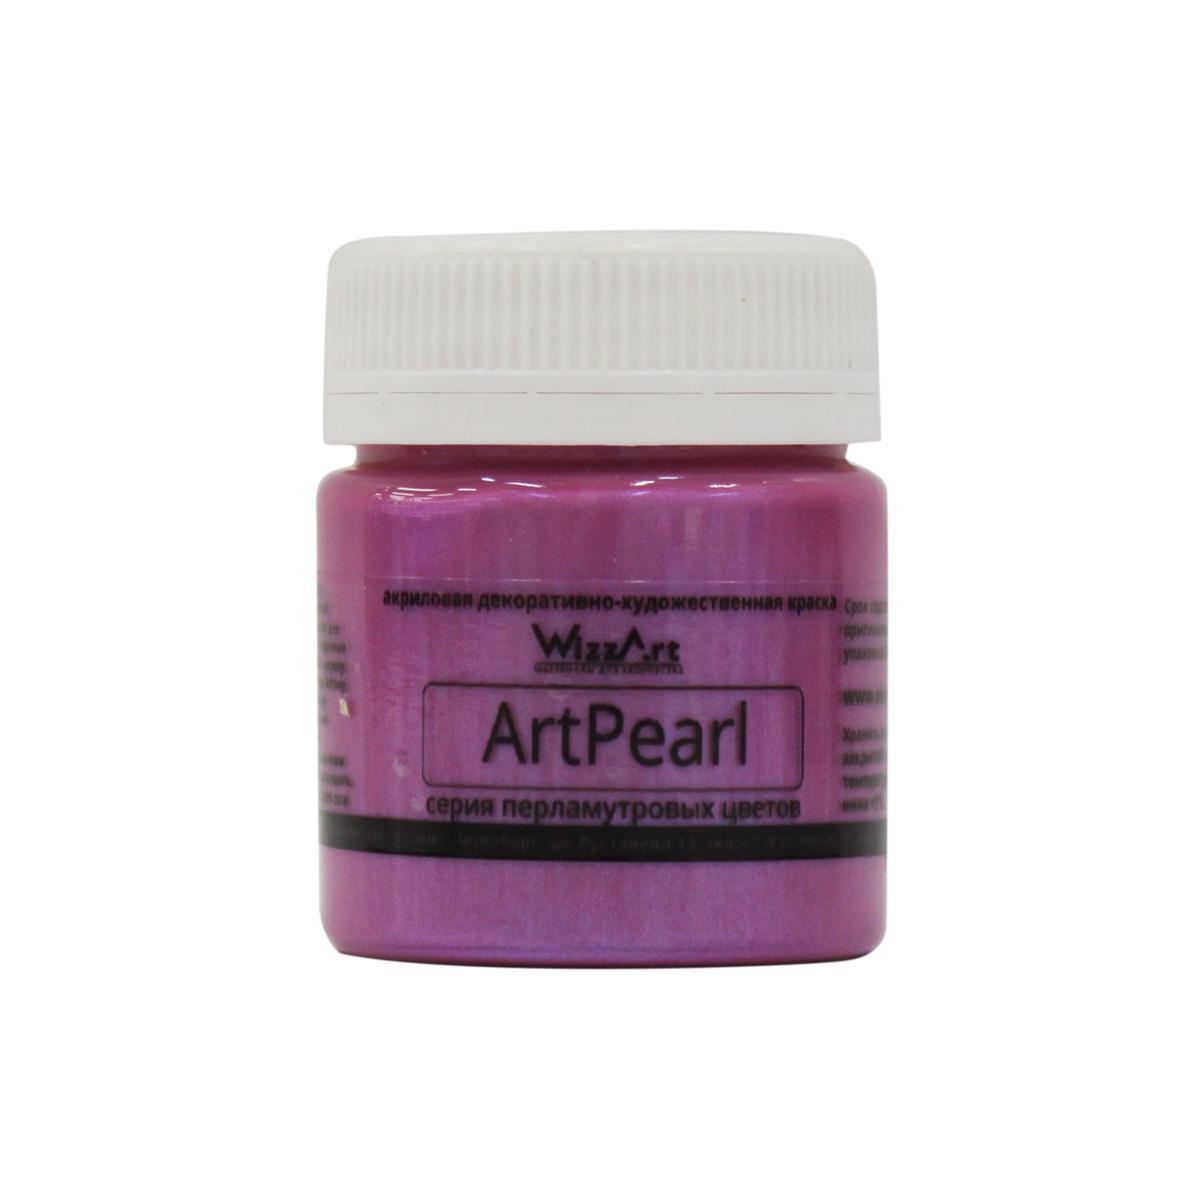 Краска акриловая Wizzart ArtPearl. Хамелеон, цвет: малиновый, 40 мл501059